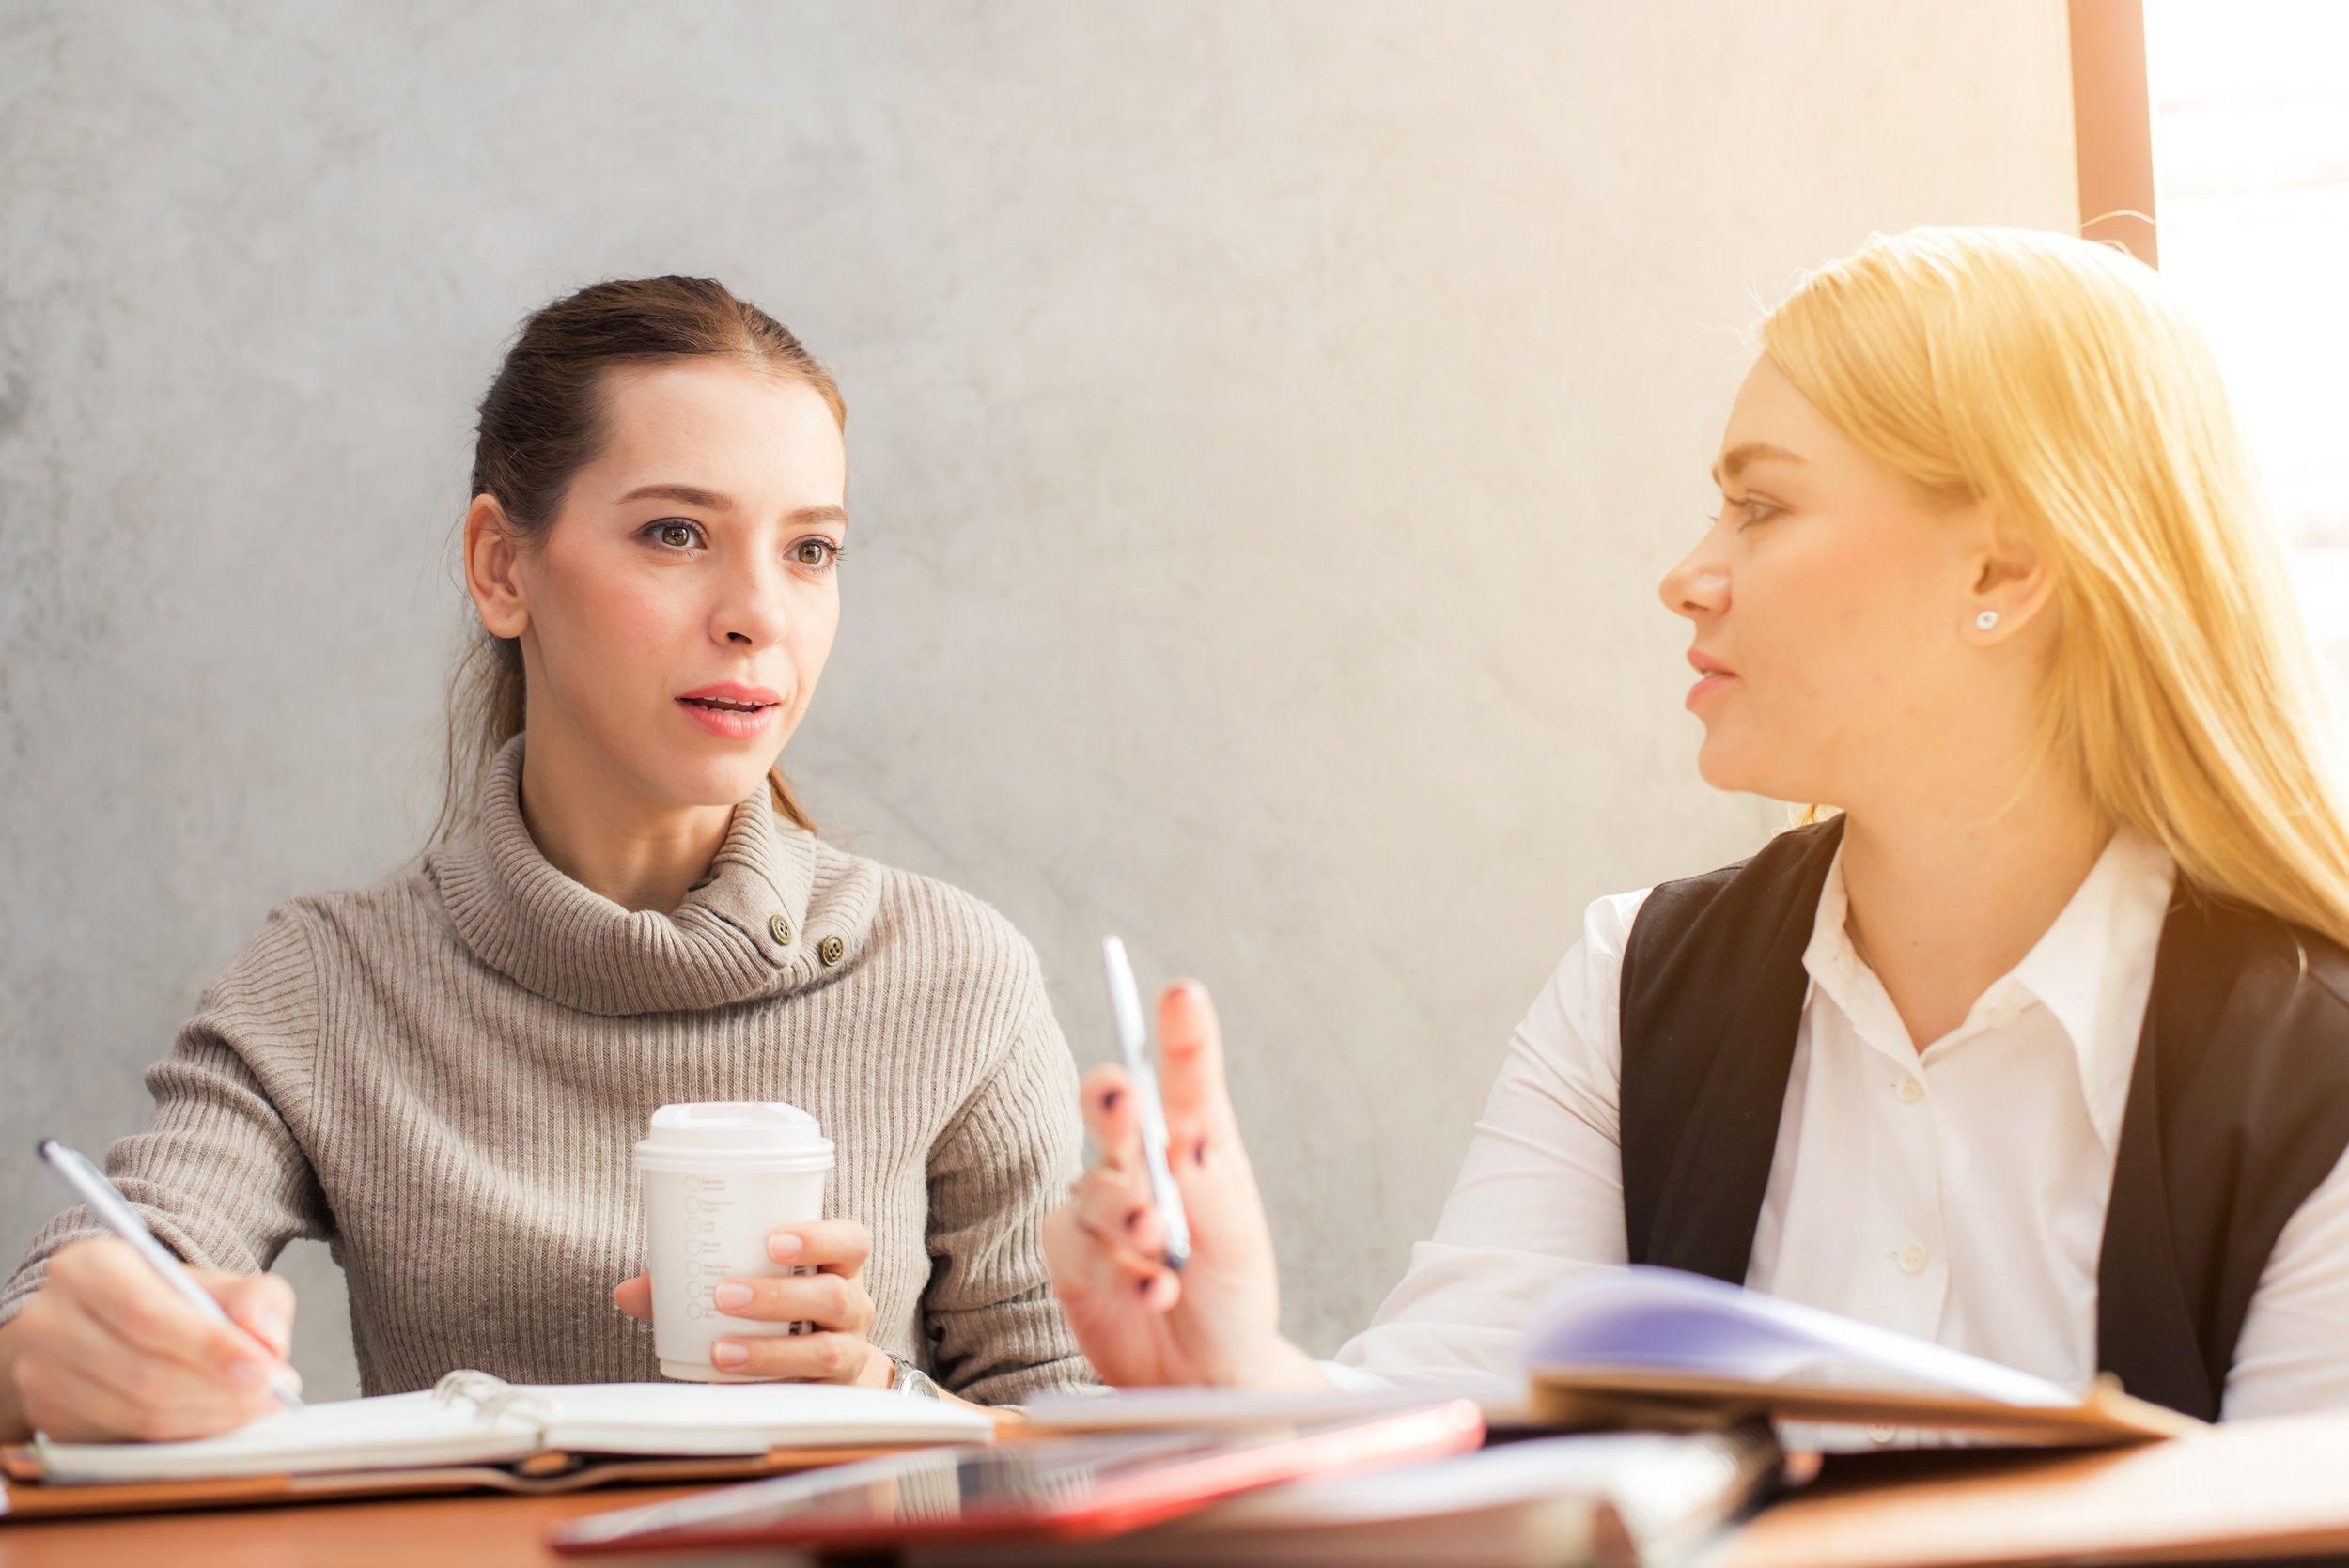 beautiful-brainstorming-businesswomen-601170 (1).jpg